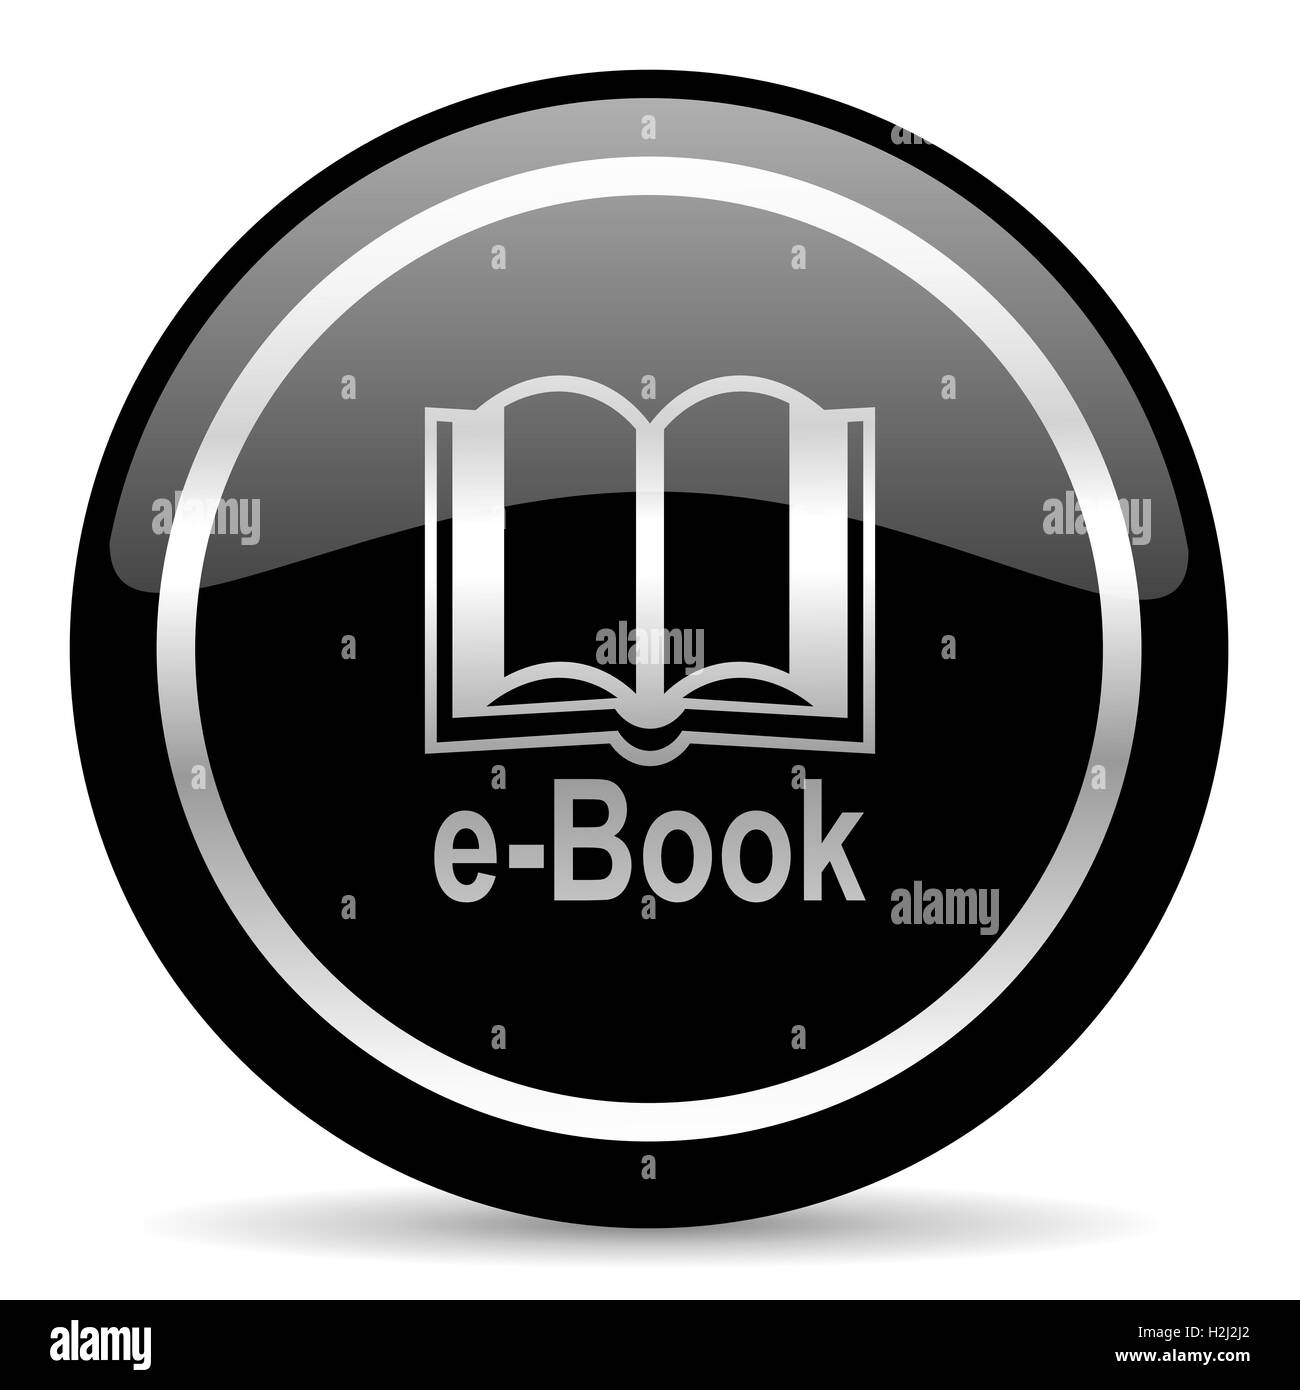 book icon - Stock Image